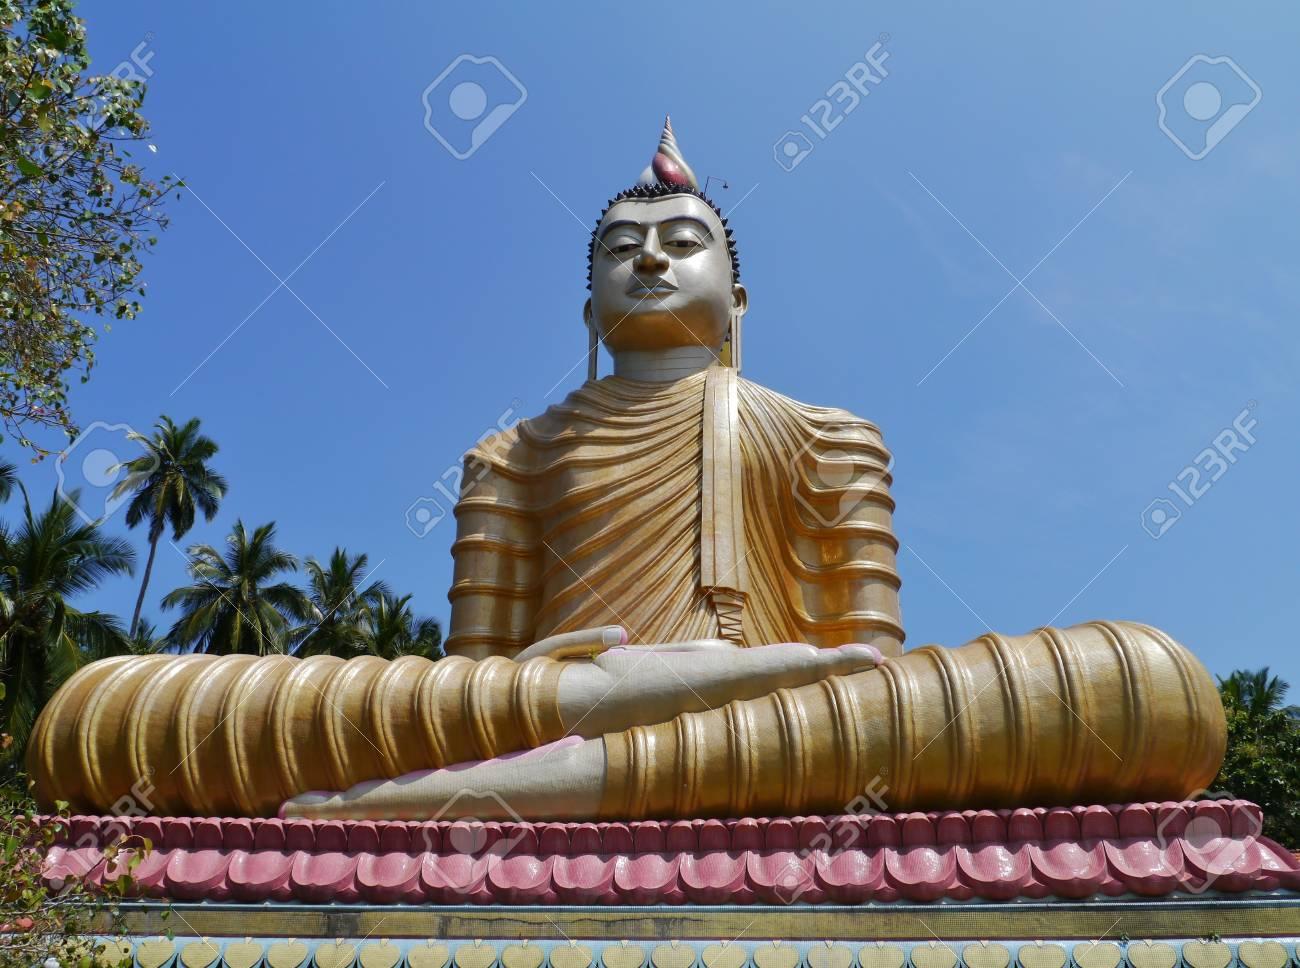 The huge statue of Buddha at wewurukannala Vihara temple in Sri Lanka Stock Photo - 18216373